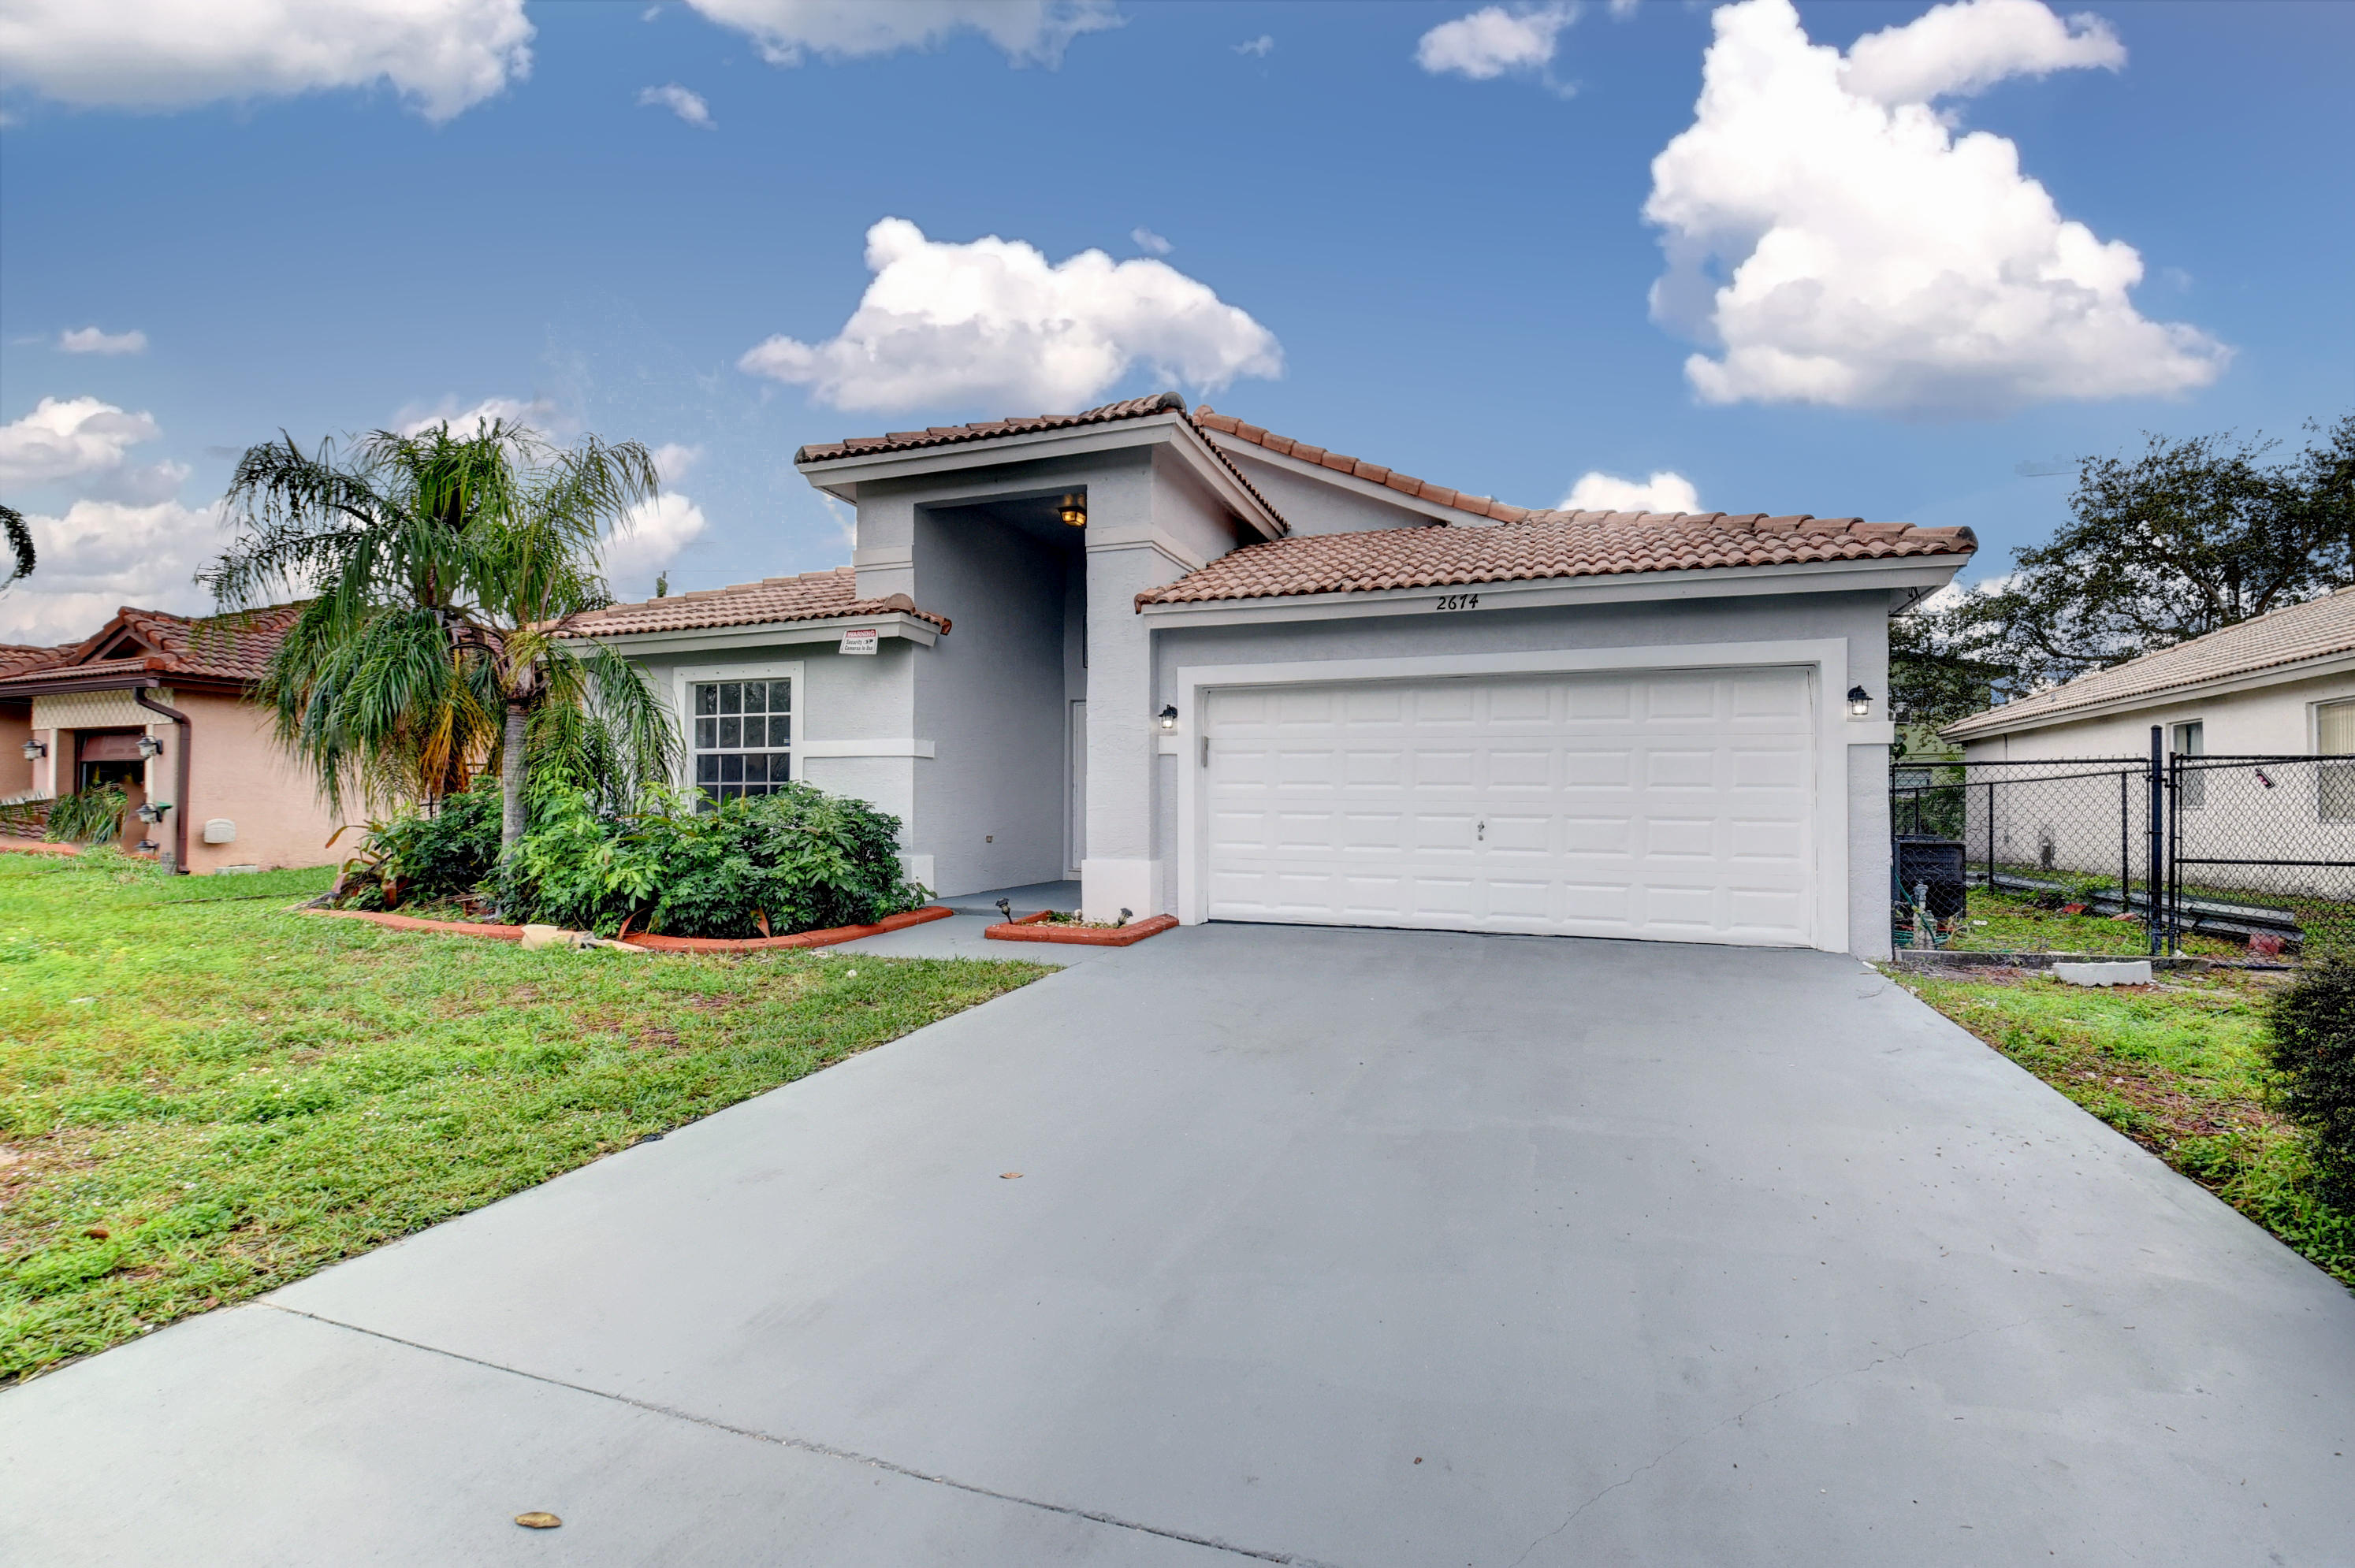 Home for sale in FRANKLIN PARK Fort Lauderdale Florida